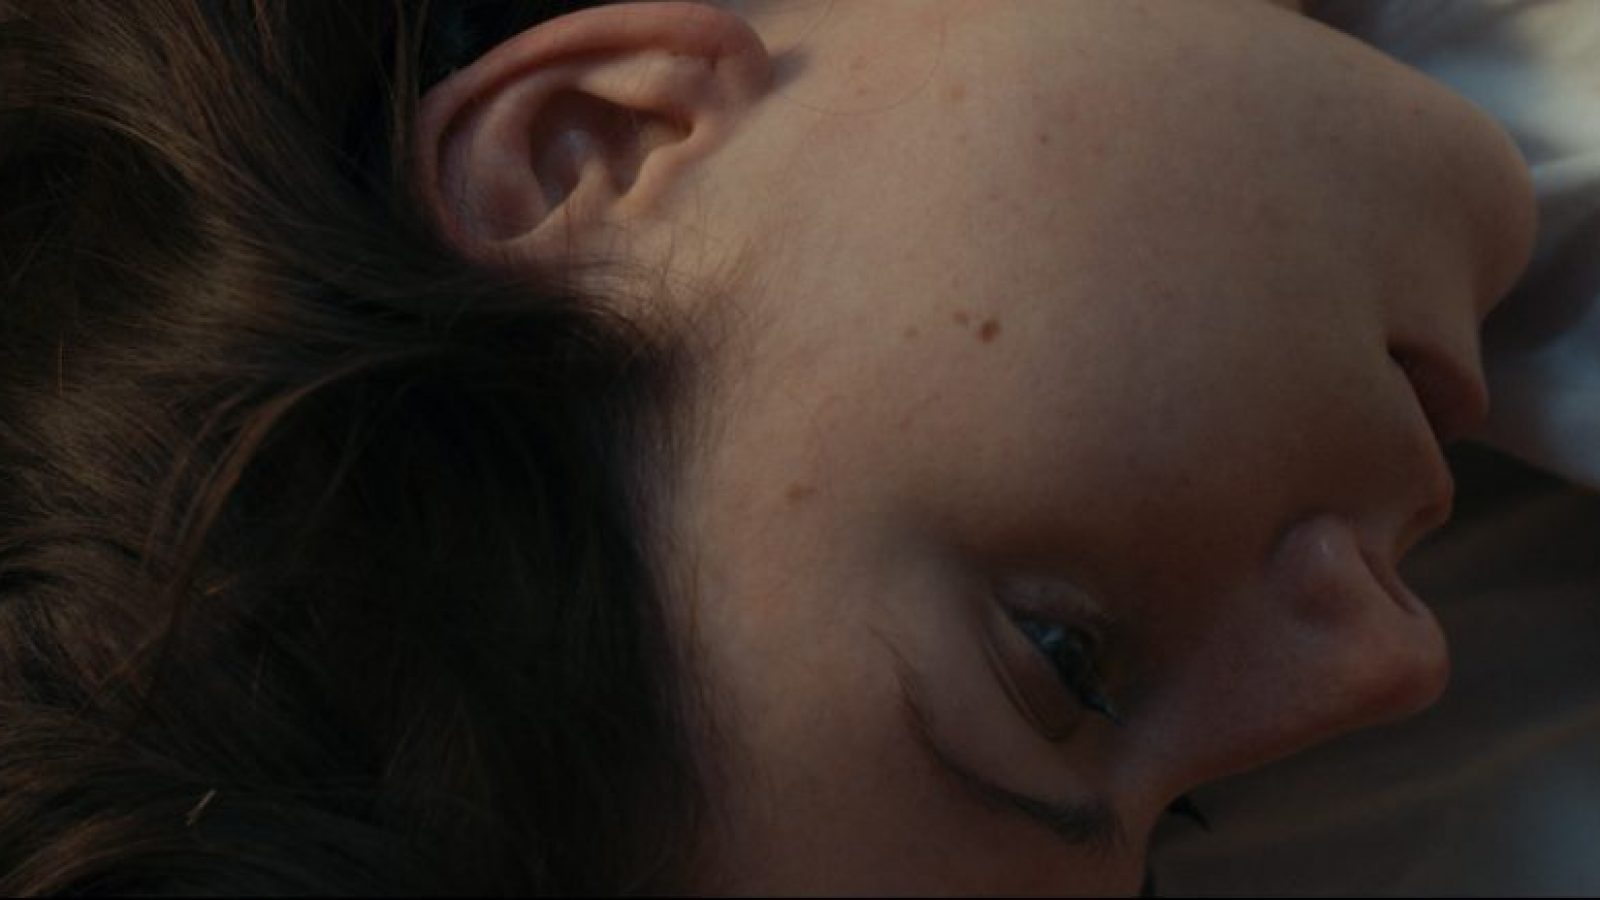 Siren promo still - Elizabeth in bed